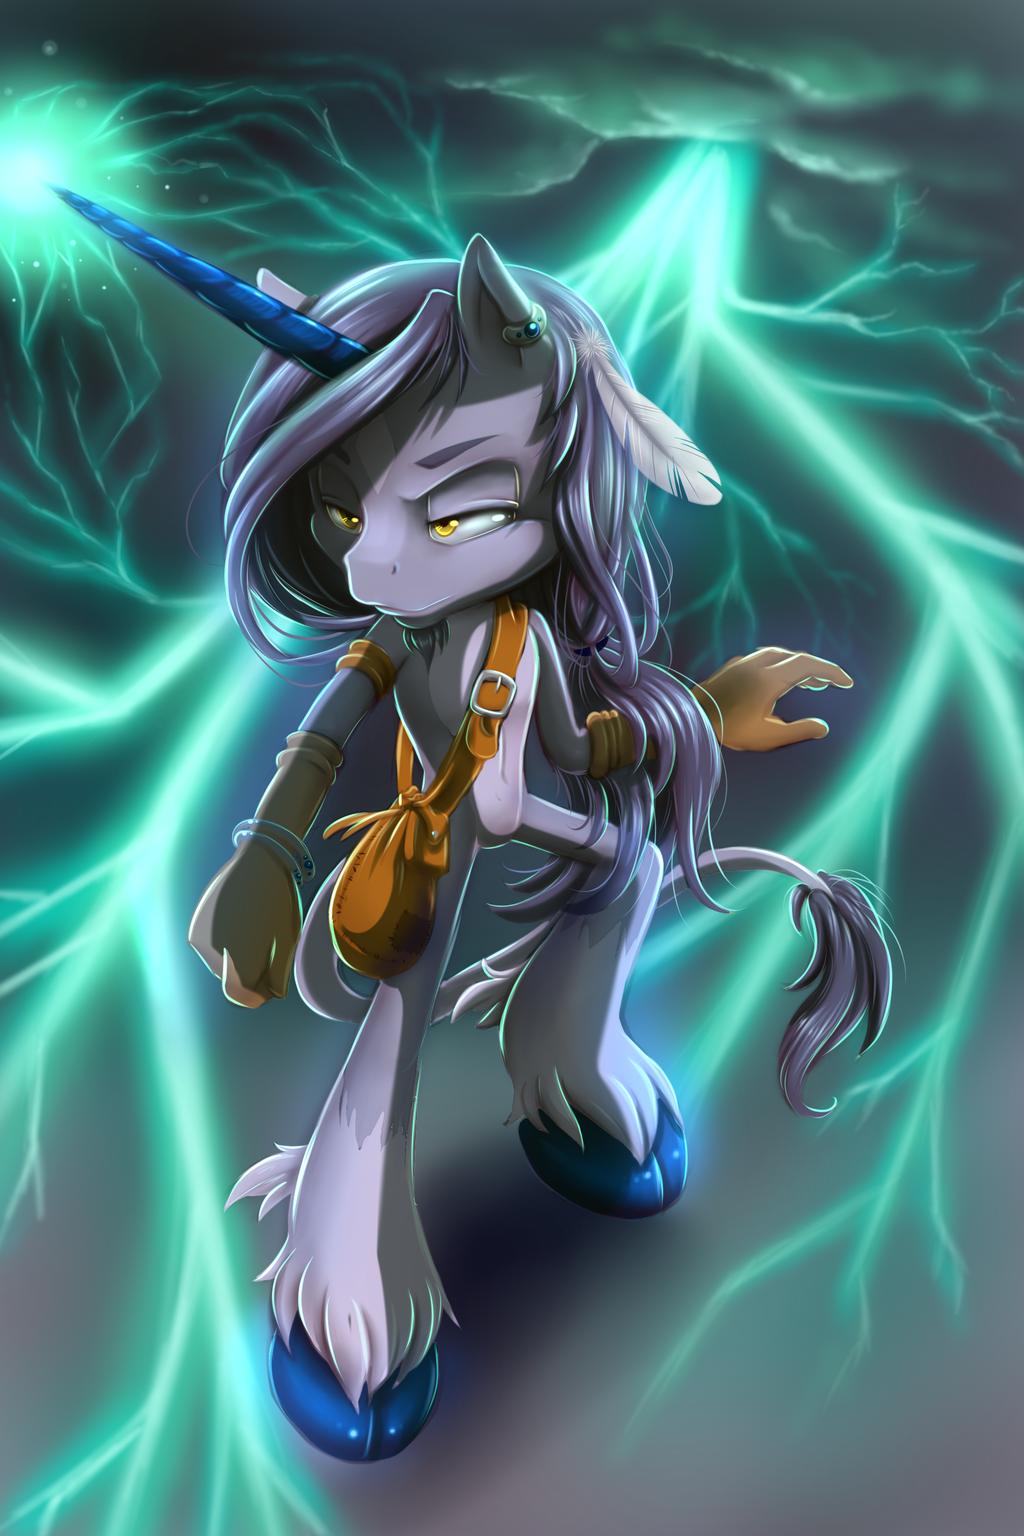 Tempest the Unicorn